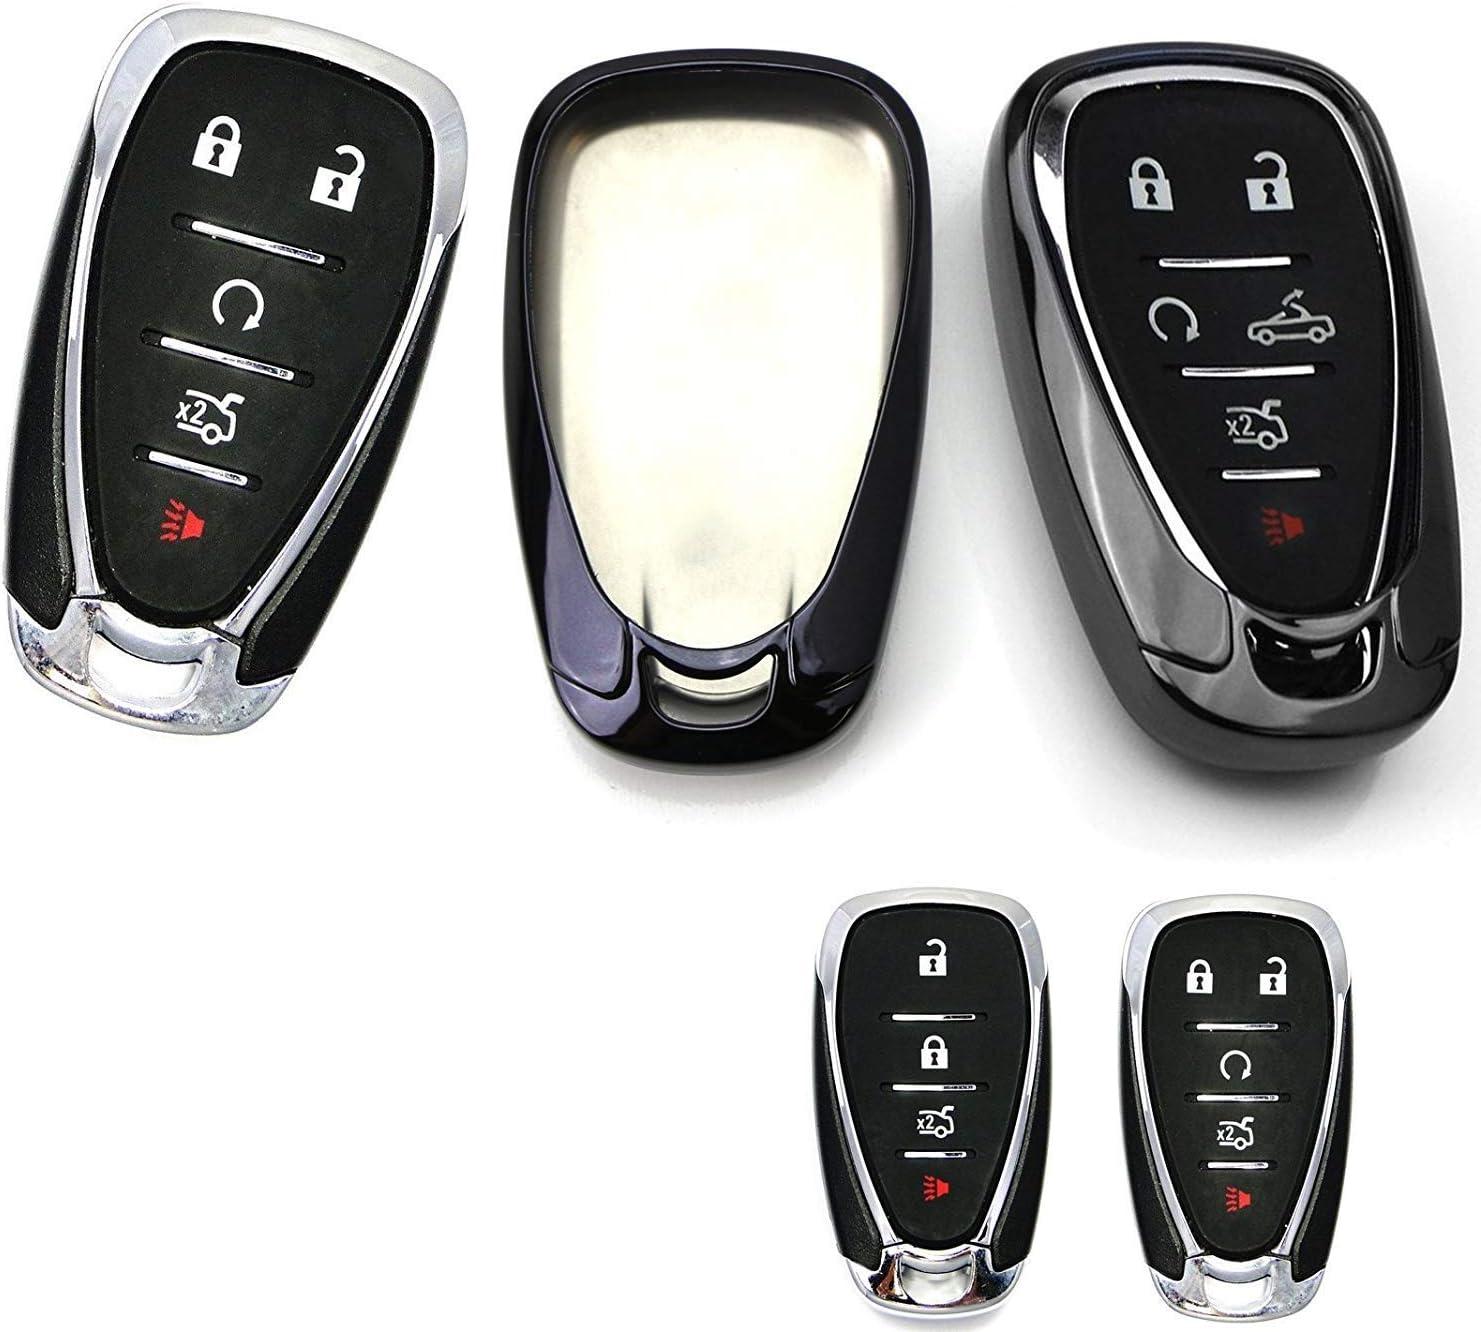 Black Cover HelloAuto Key Fob Shell Case Protector Holder Compatible with Chevrolet Chevy Malibu Camaro Cruze Traverse Sonic Volt Bolt Equinox